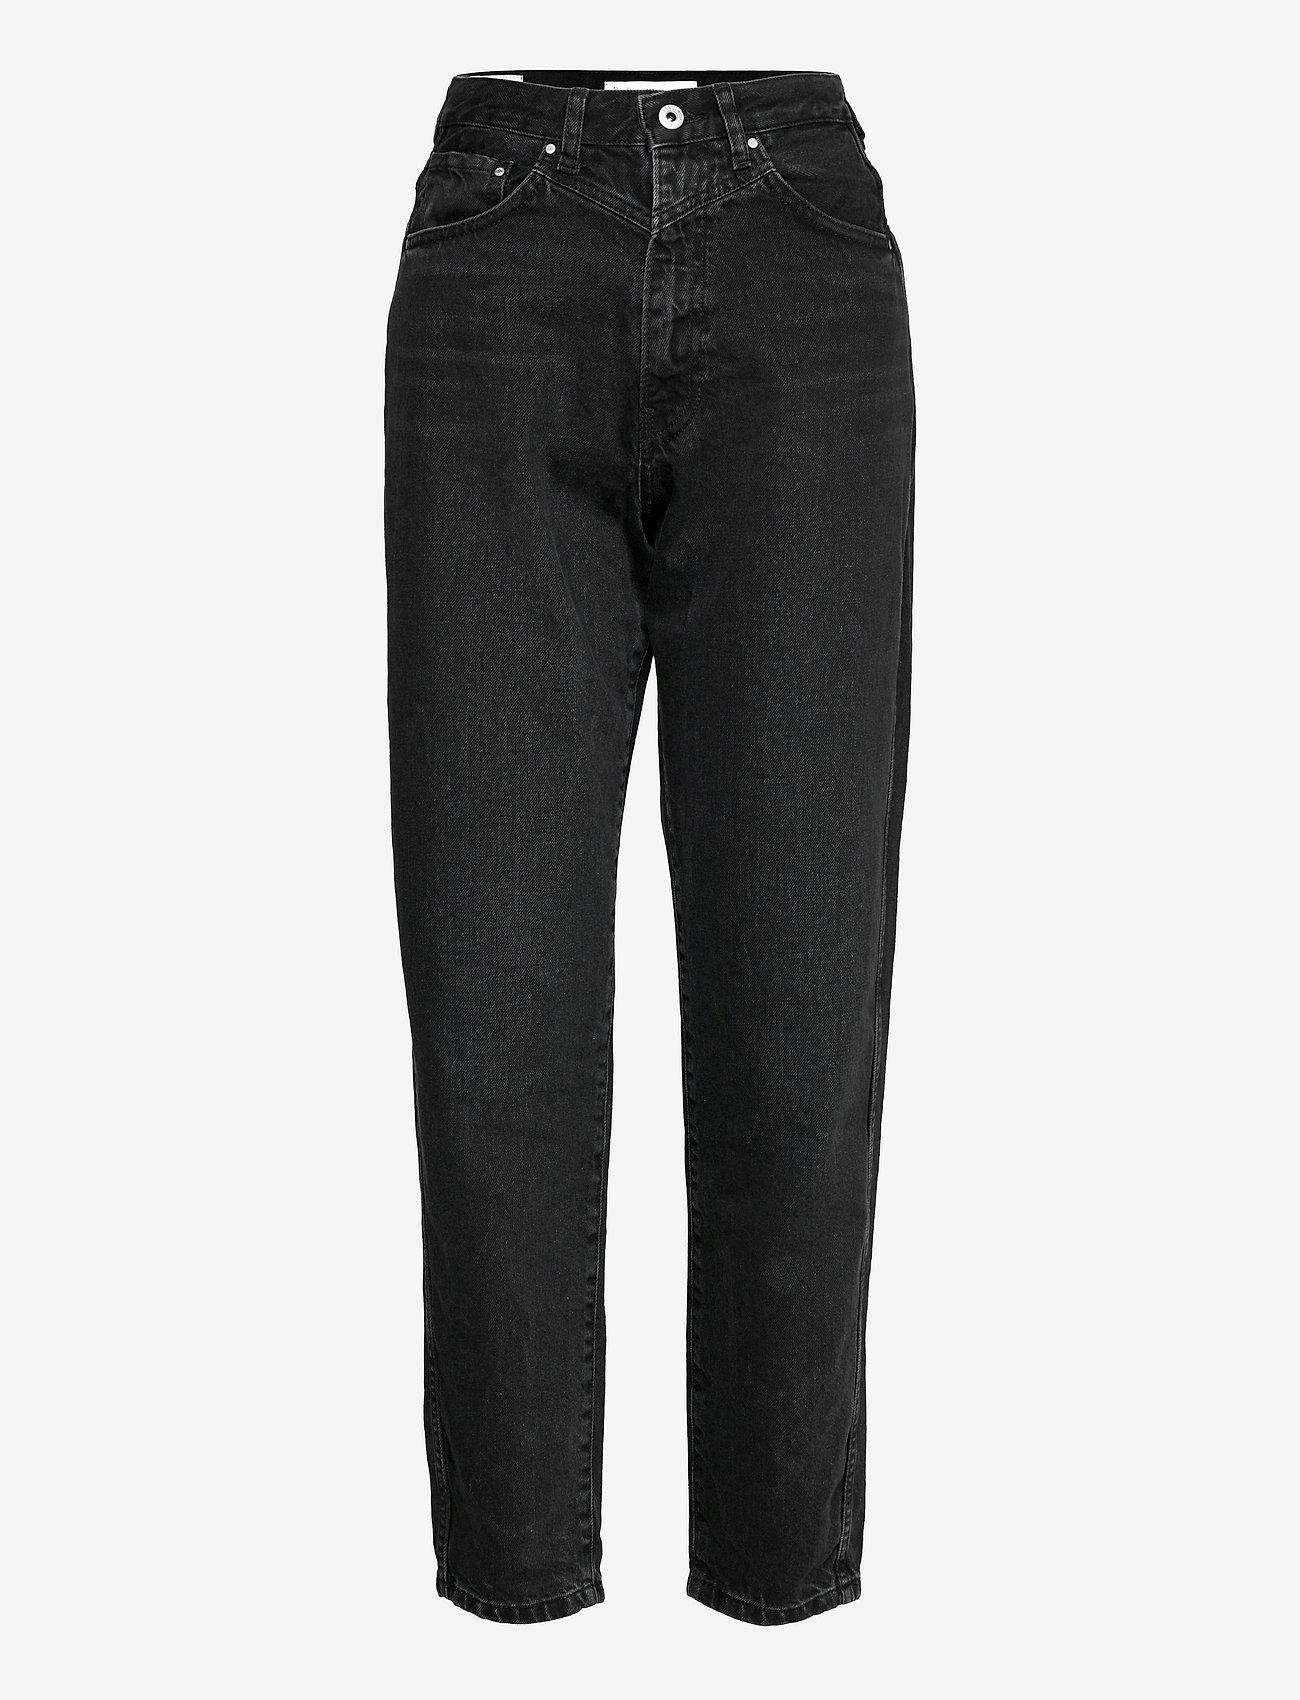 Pepe Jeans London - RACHEL - mammajeans - denim - 0